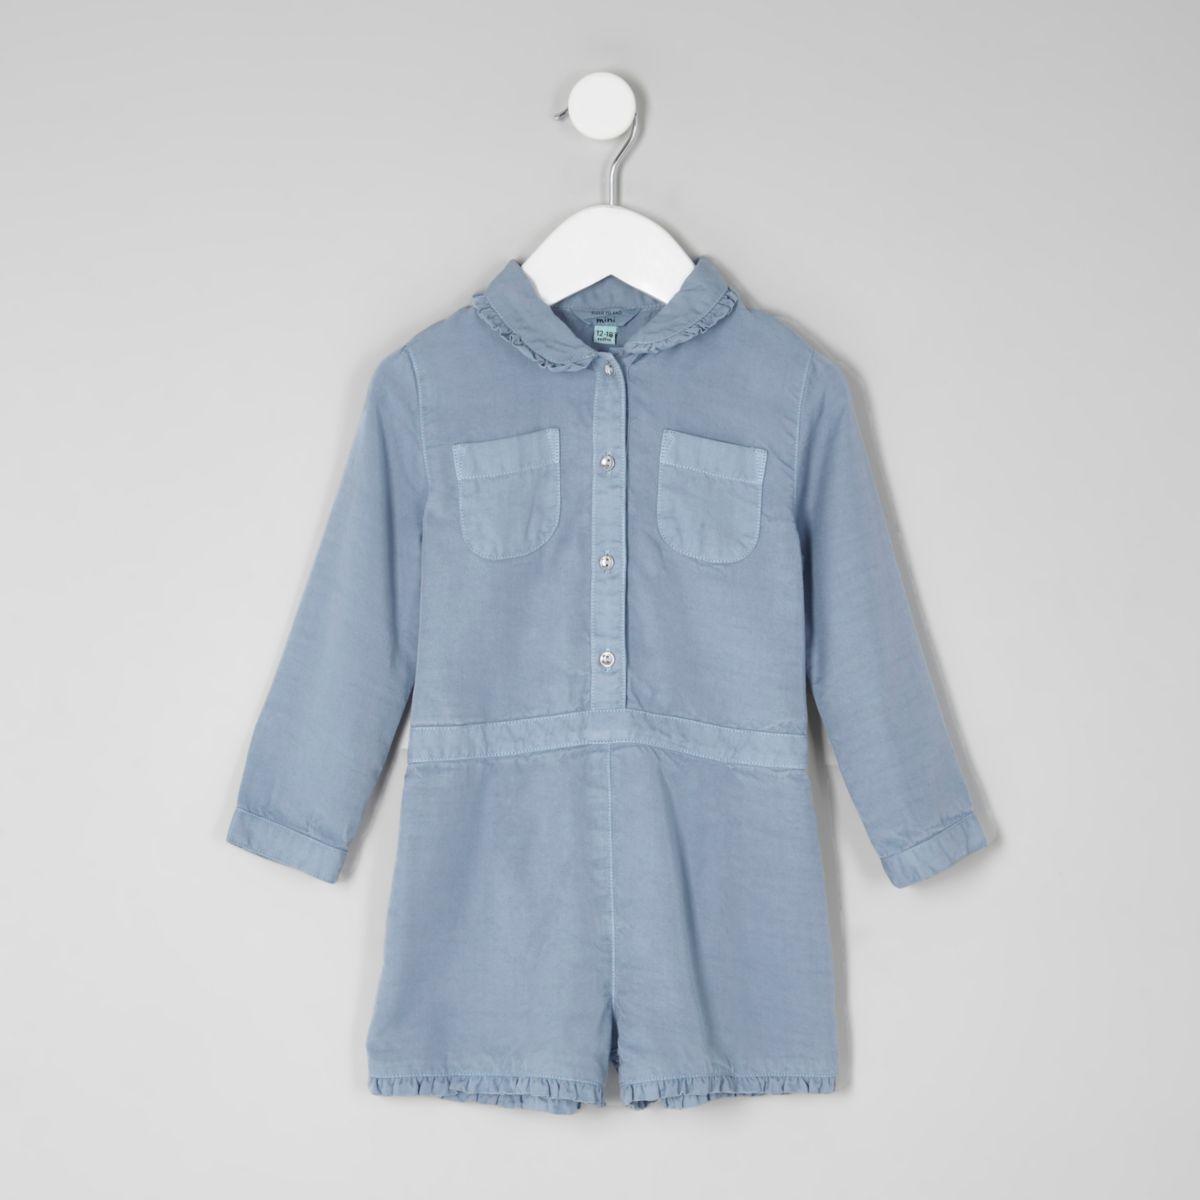 Mini girls blue long sleeve romper